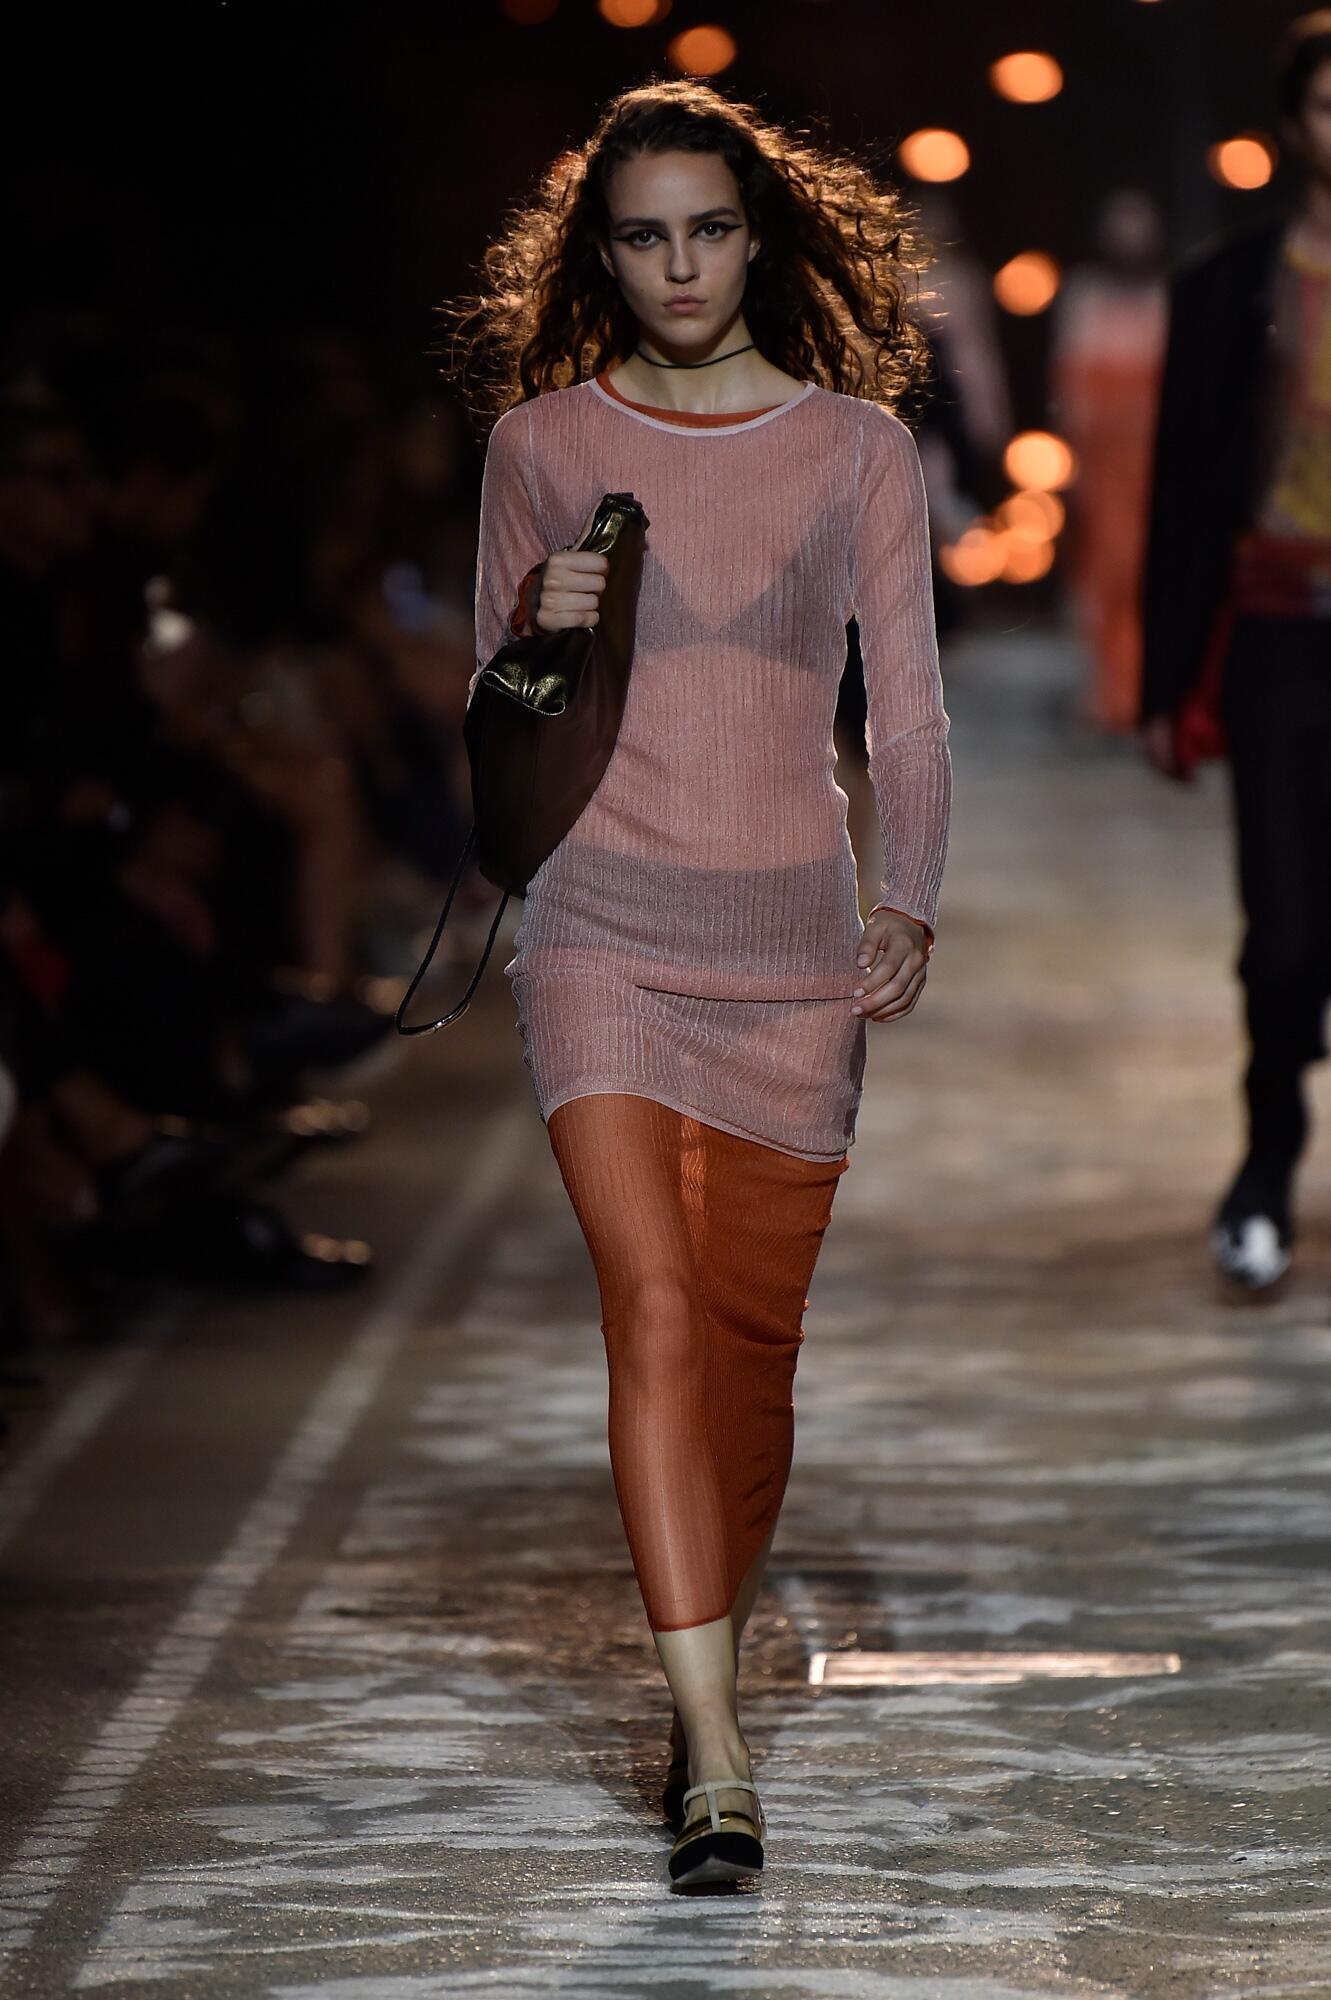 Hugo 2018 Pitti Immagine Woman Trends